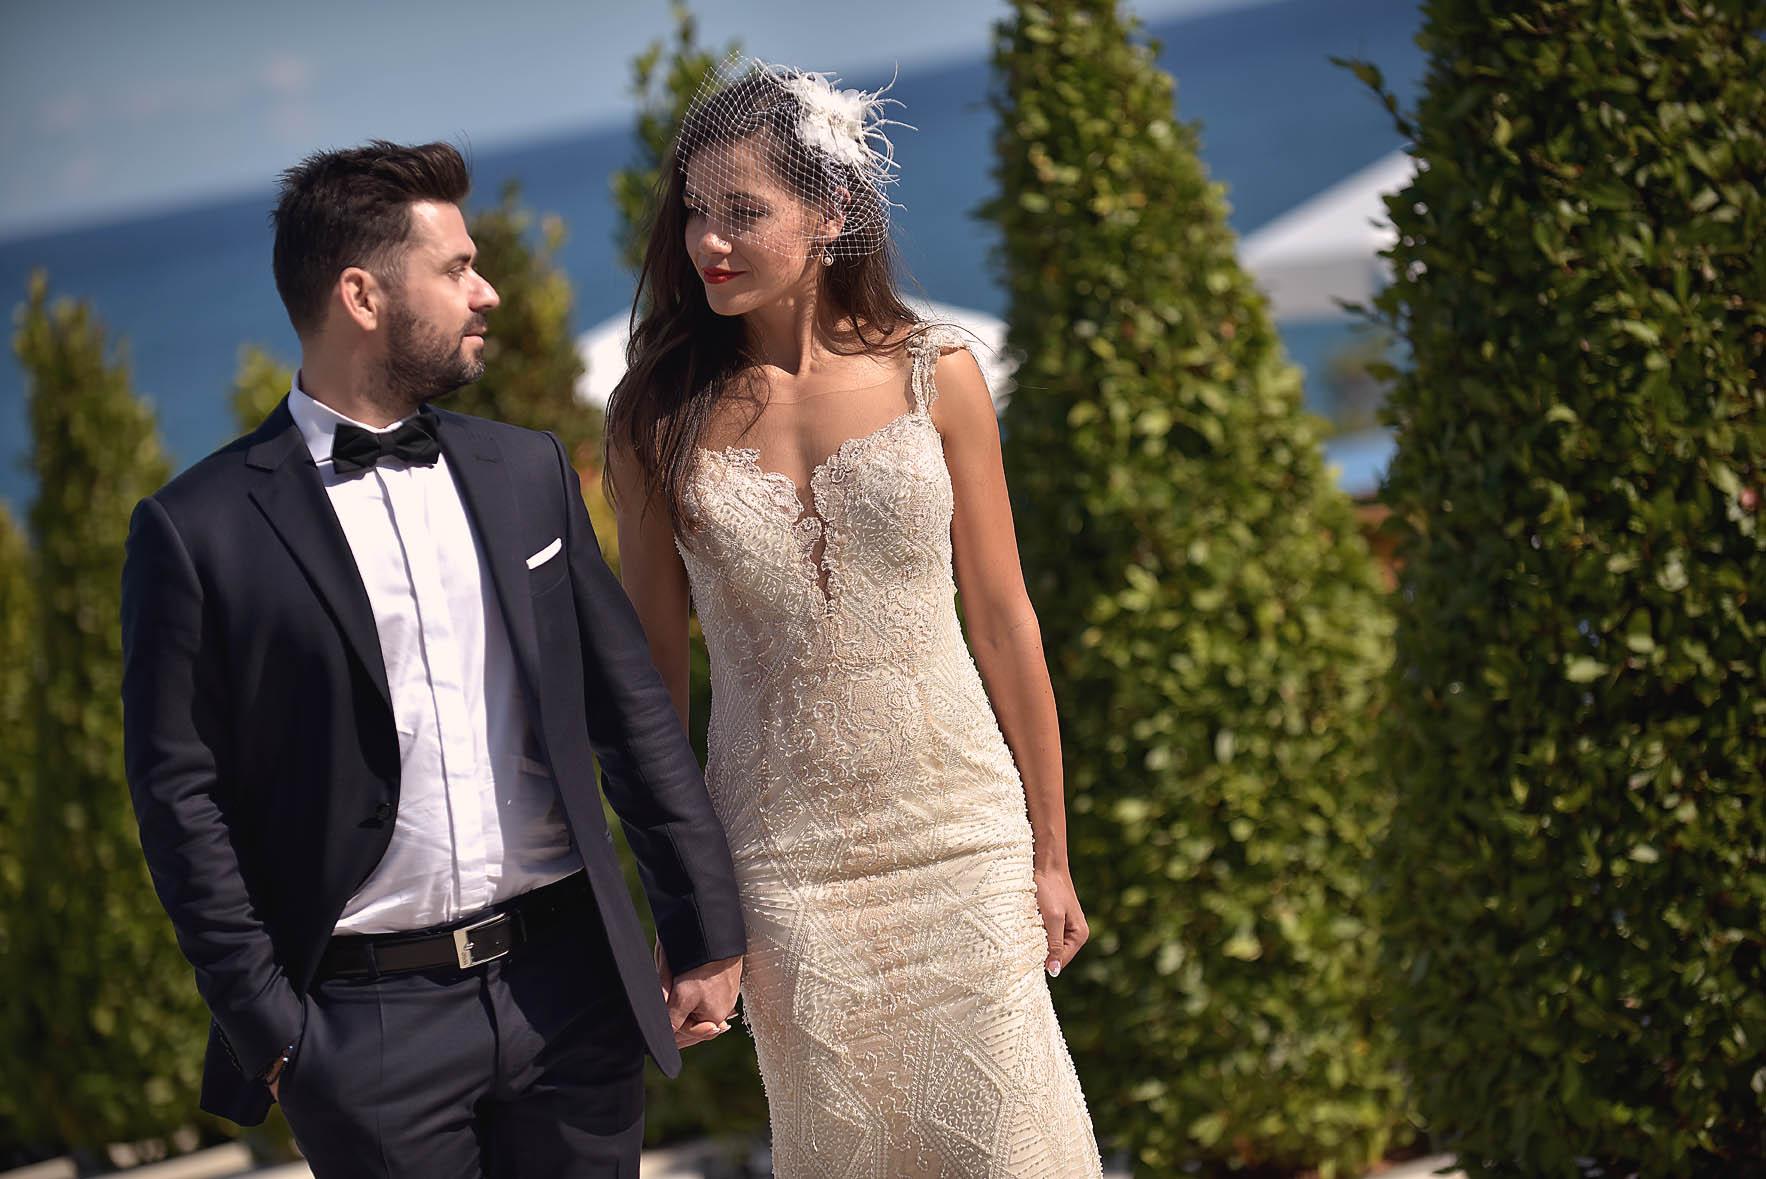 fine-art-photography-wedding-Cavo Olympo-01